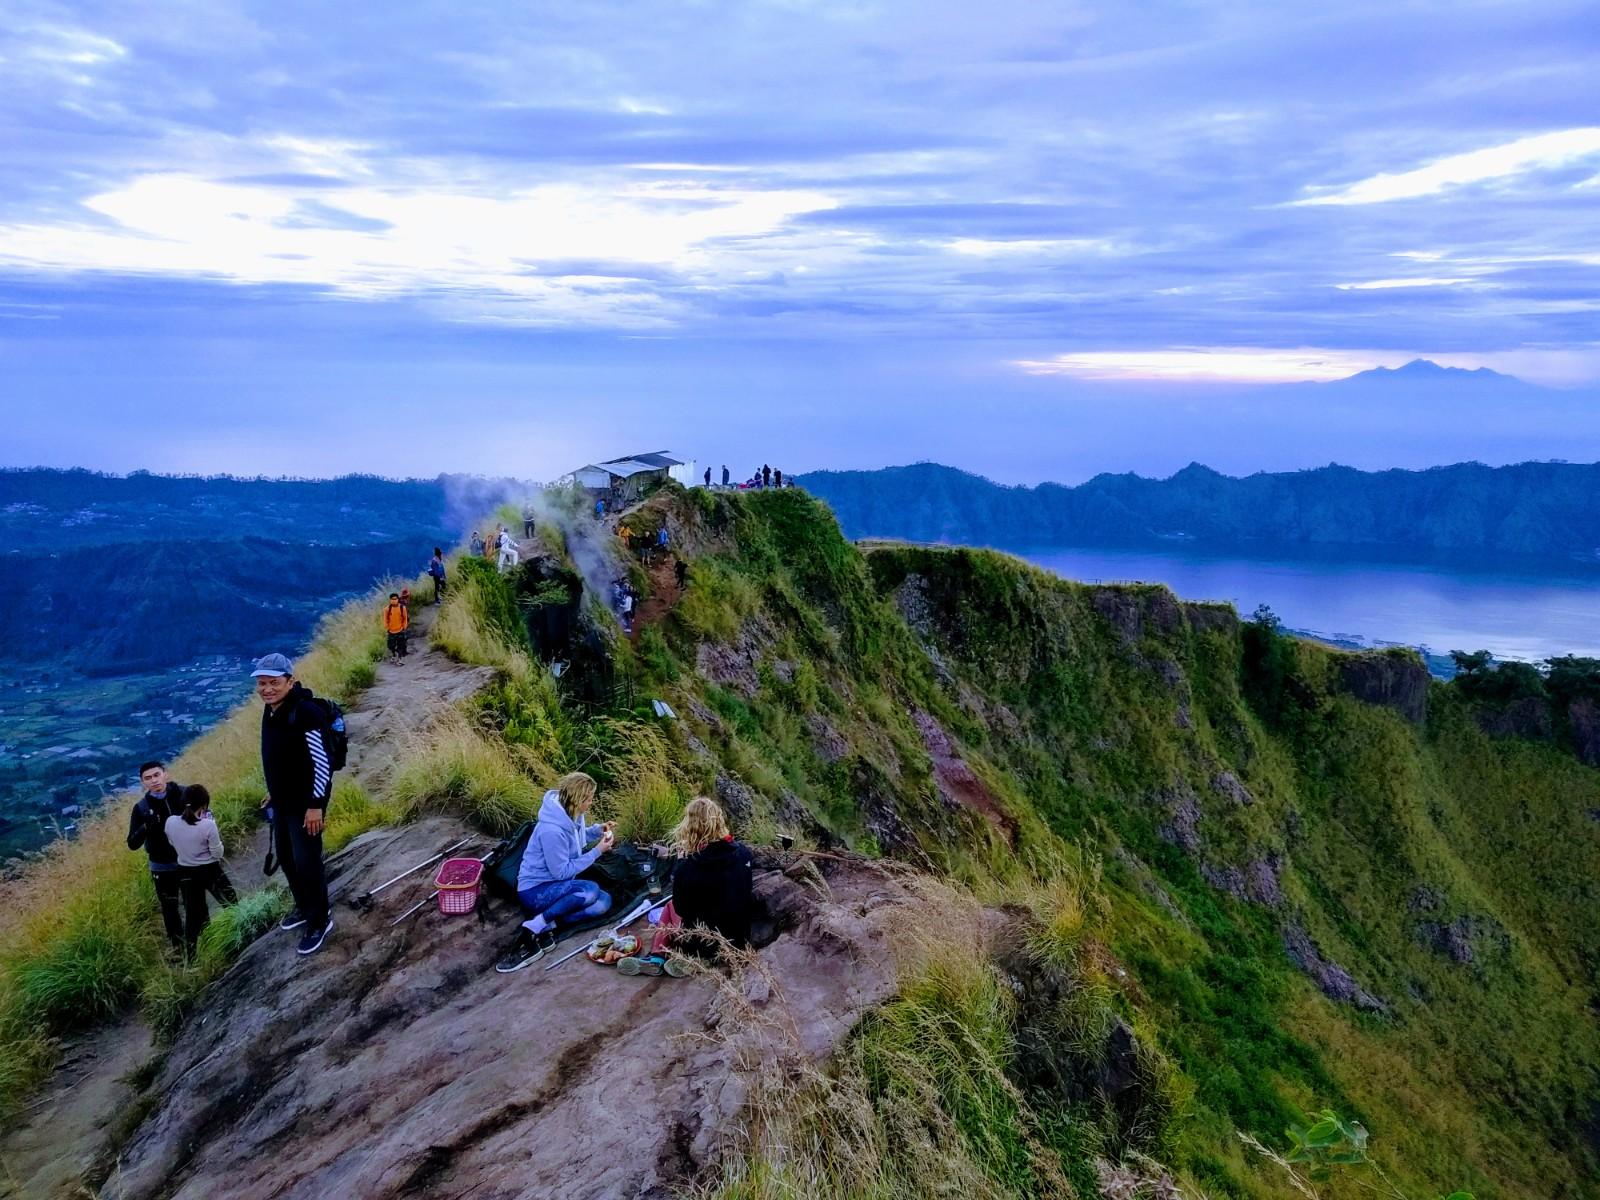 Mount Batur Trekking With Hot Spring 2